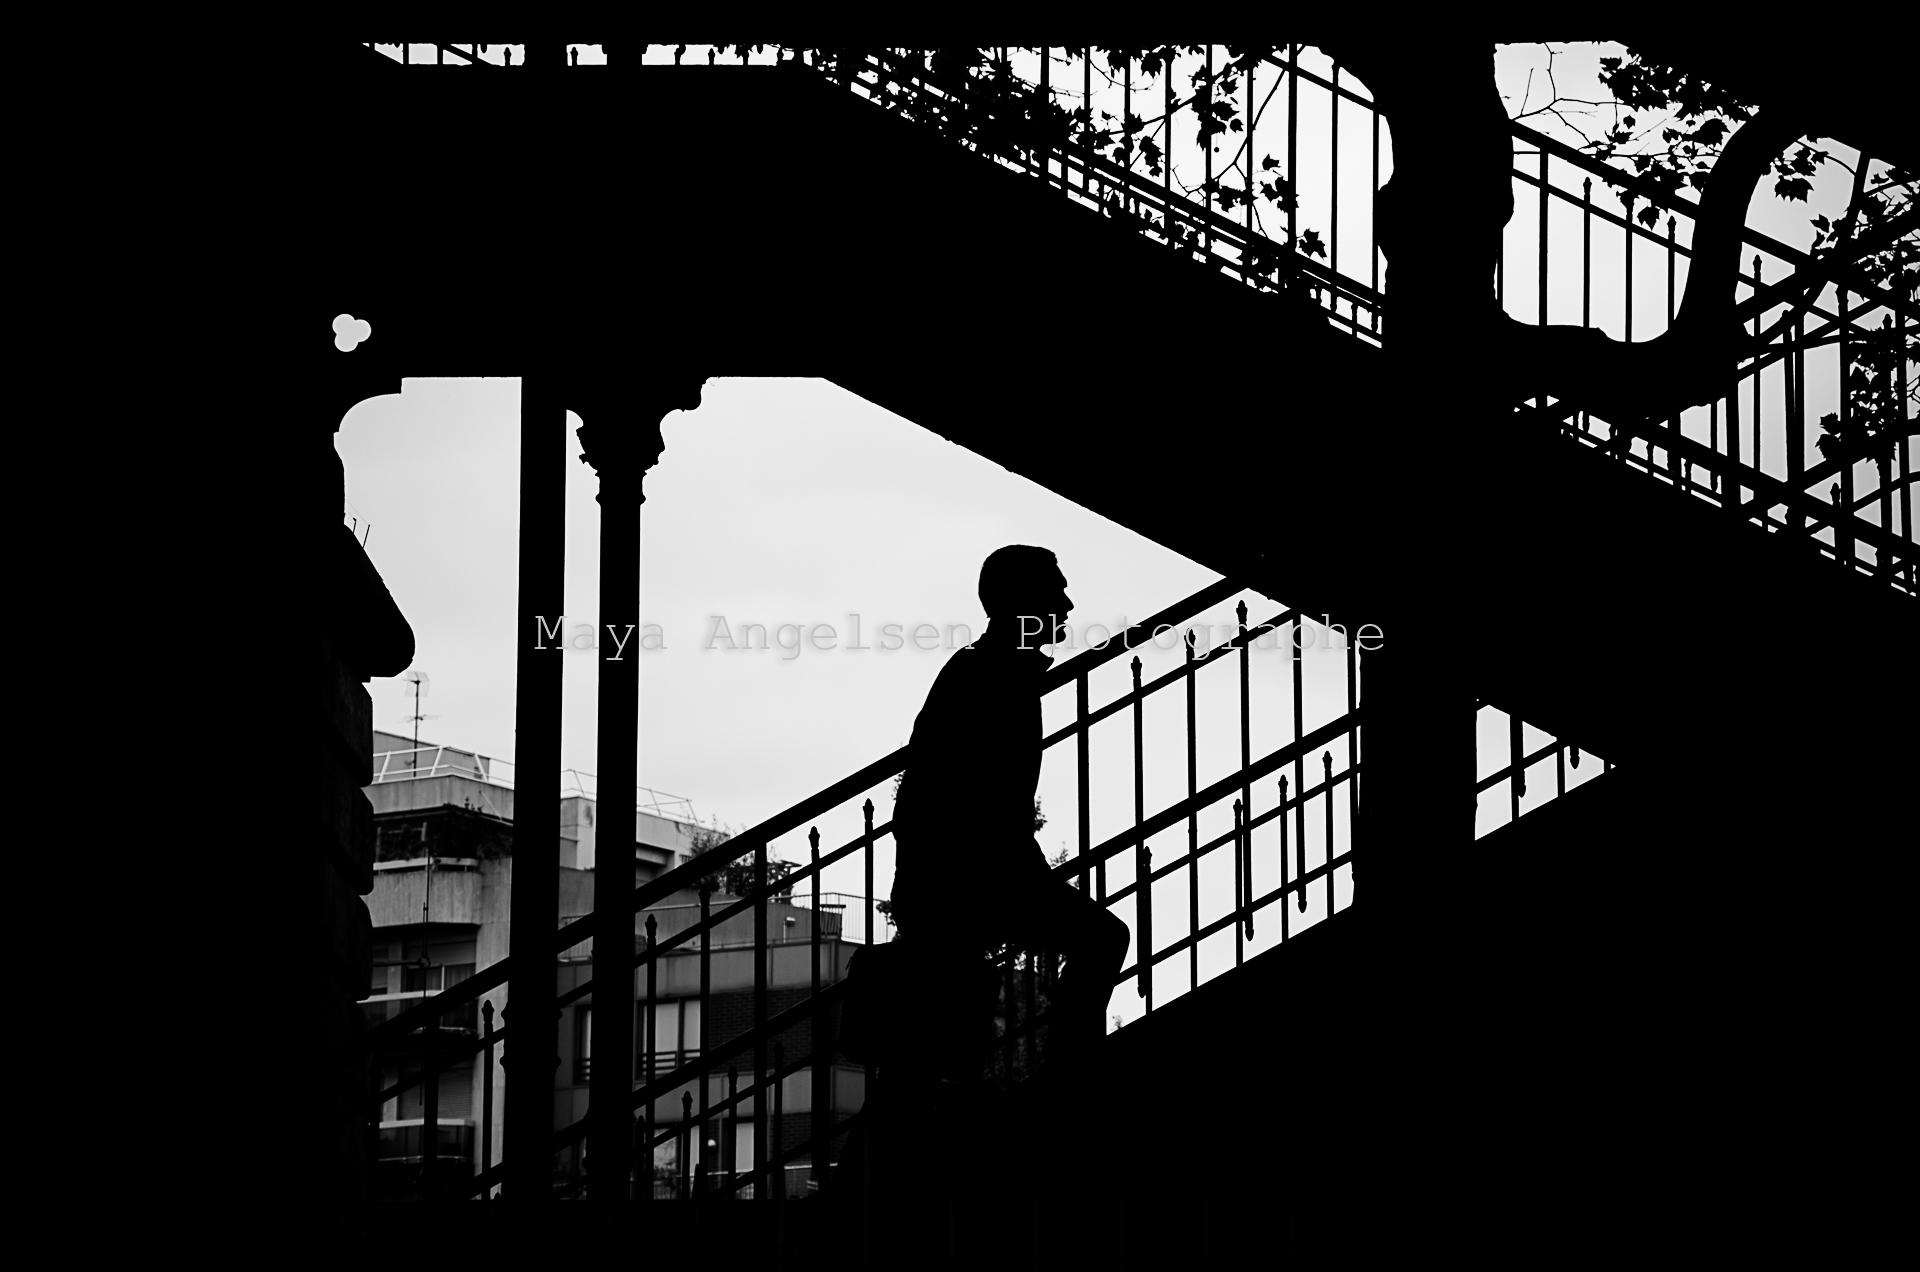 Photographe-streetphoto-maya-angelsen-Profil